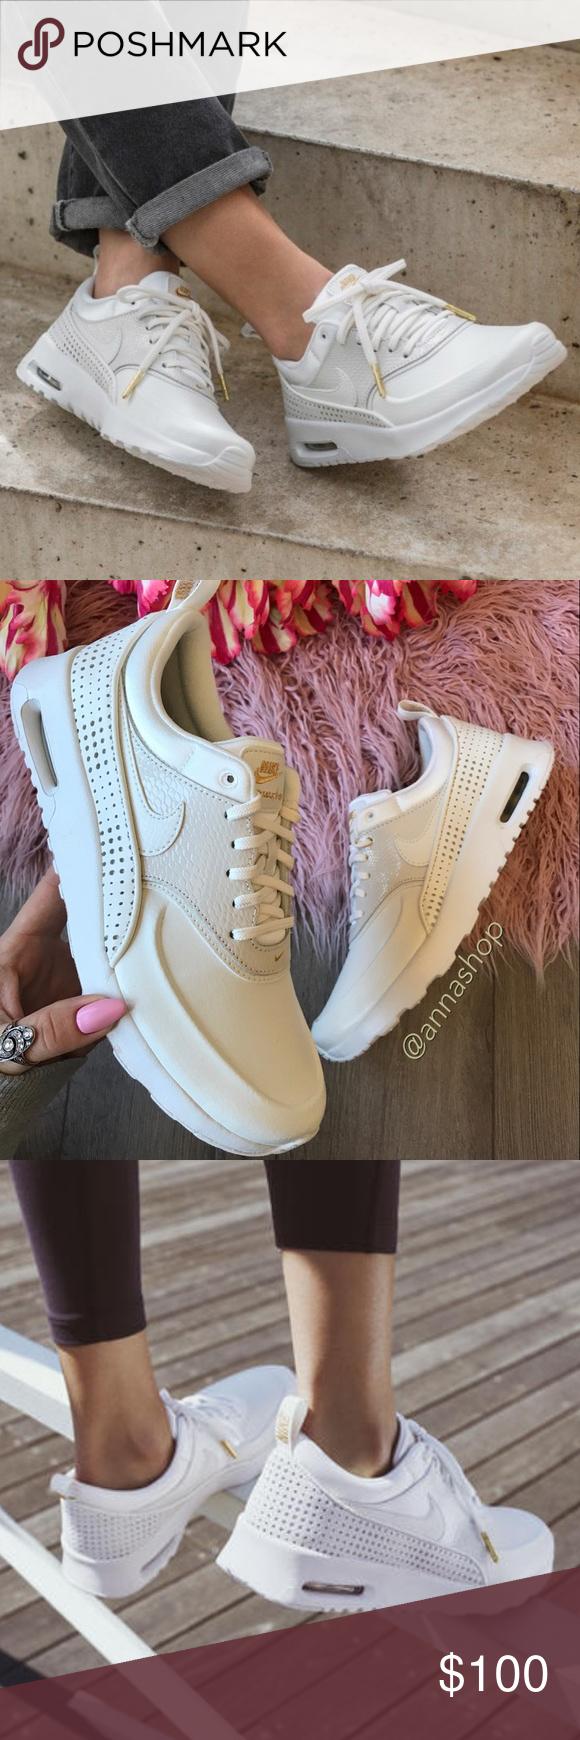 nike air max thea premium leather white